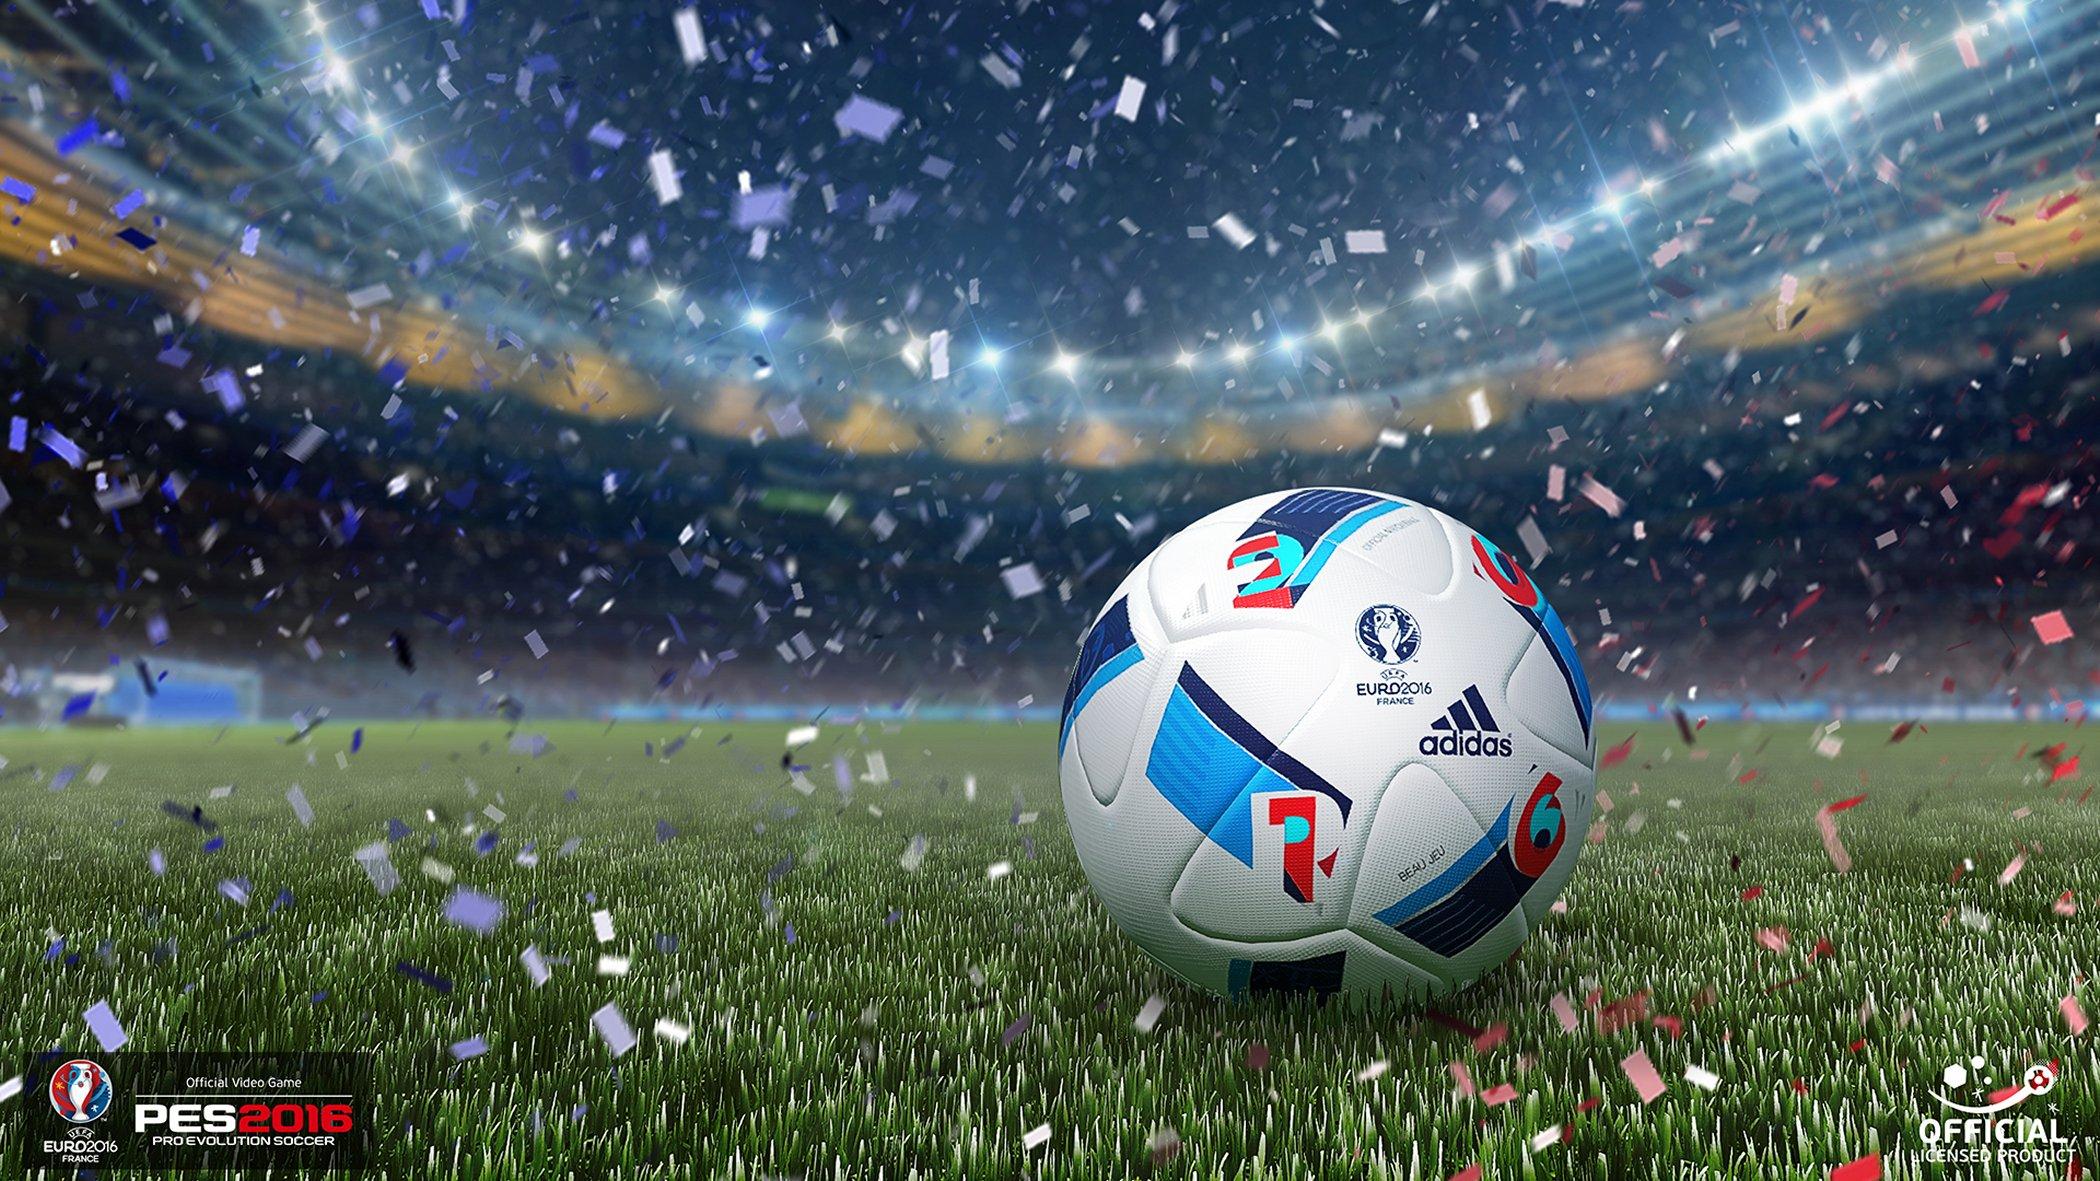 c03001c348c50 PES dostalo aktualizáciu so šampionátom UEFA EURO 2016 | Sector